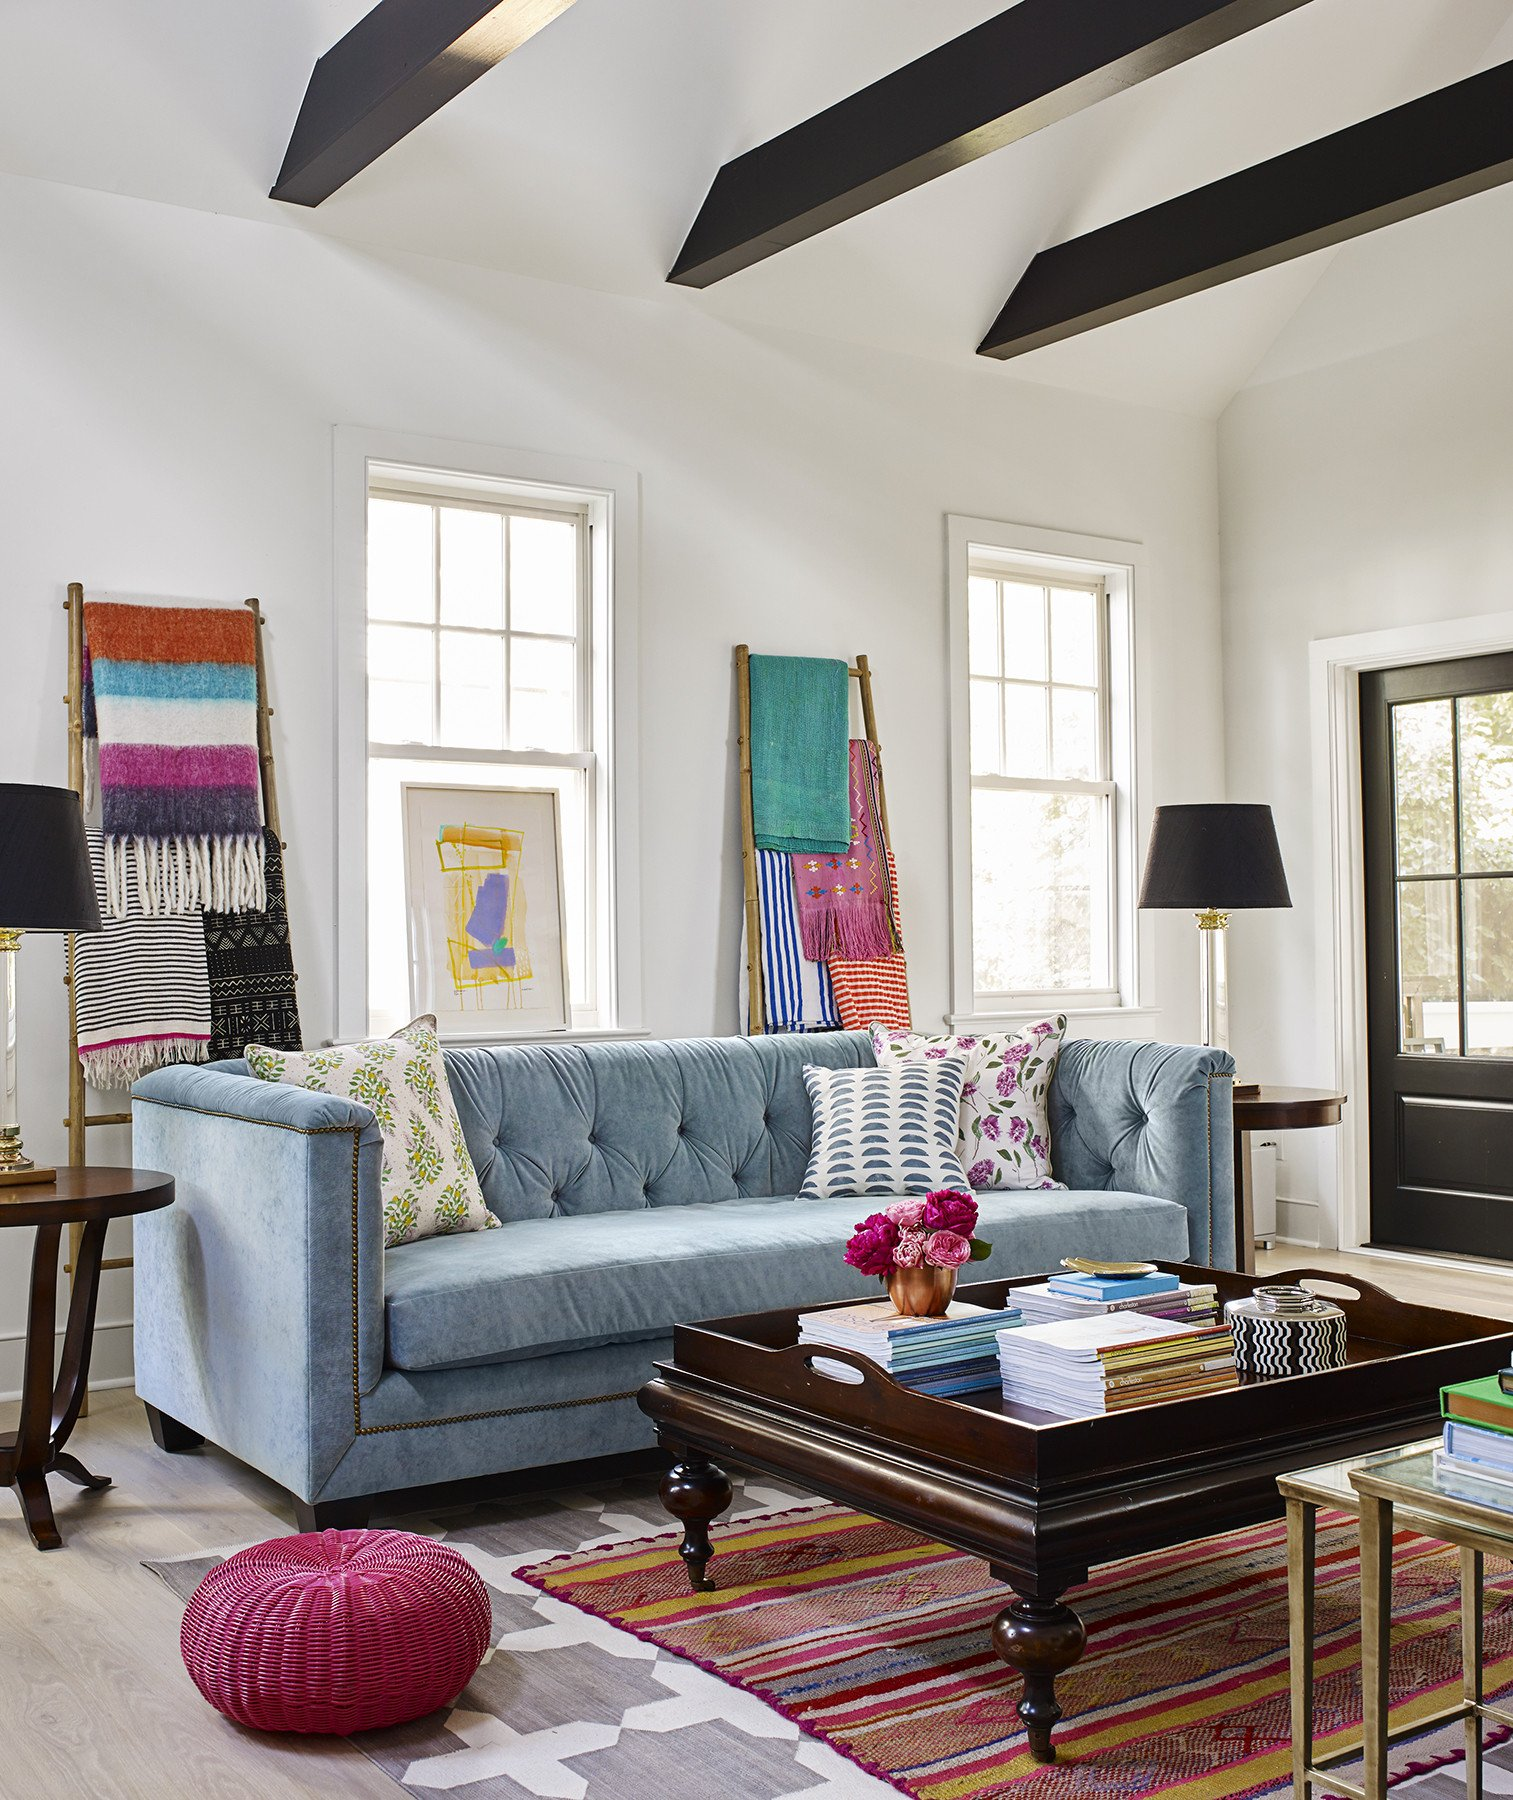 Simple Living Room Decorating Ideas Inspirational 22 Modern Living Room Design Ideas